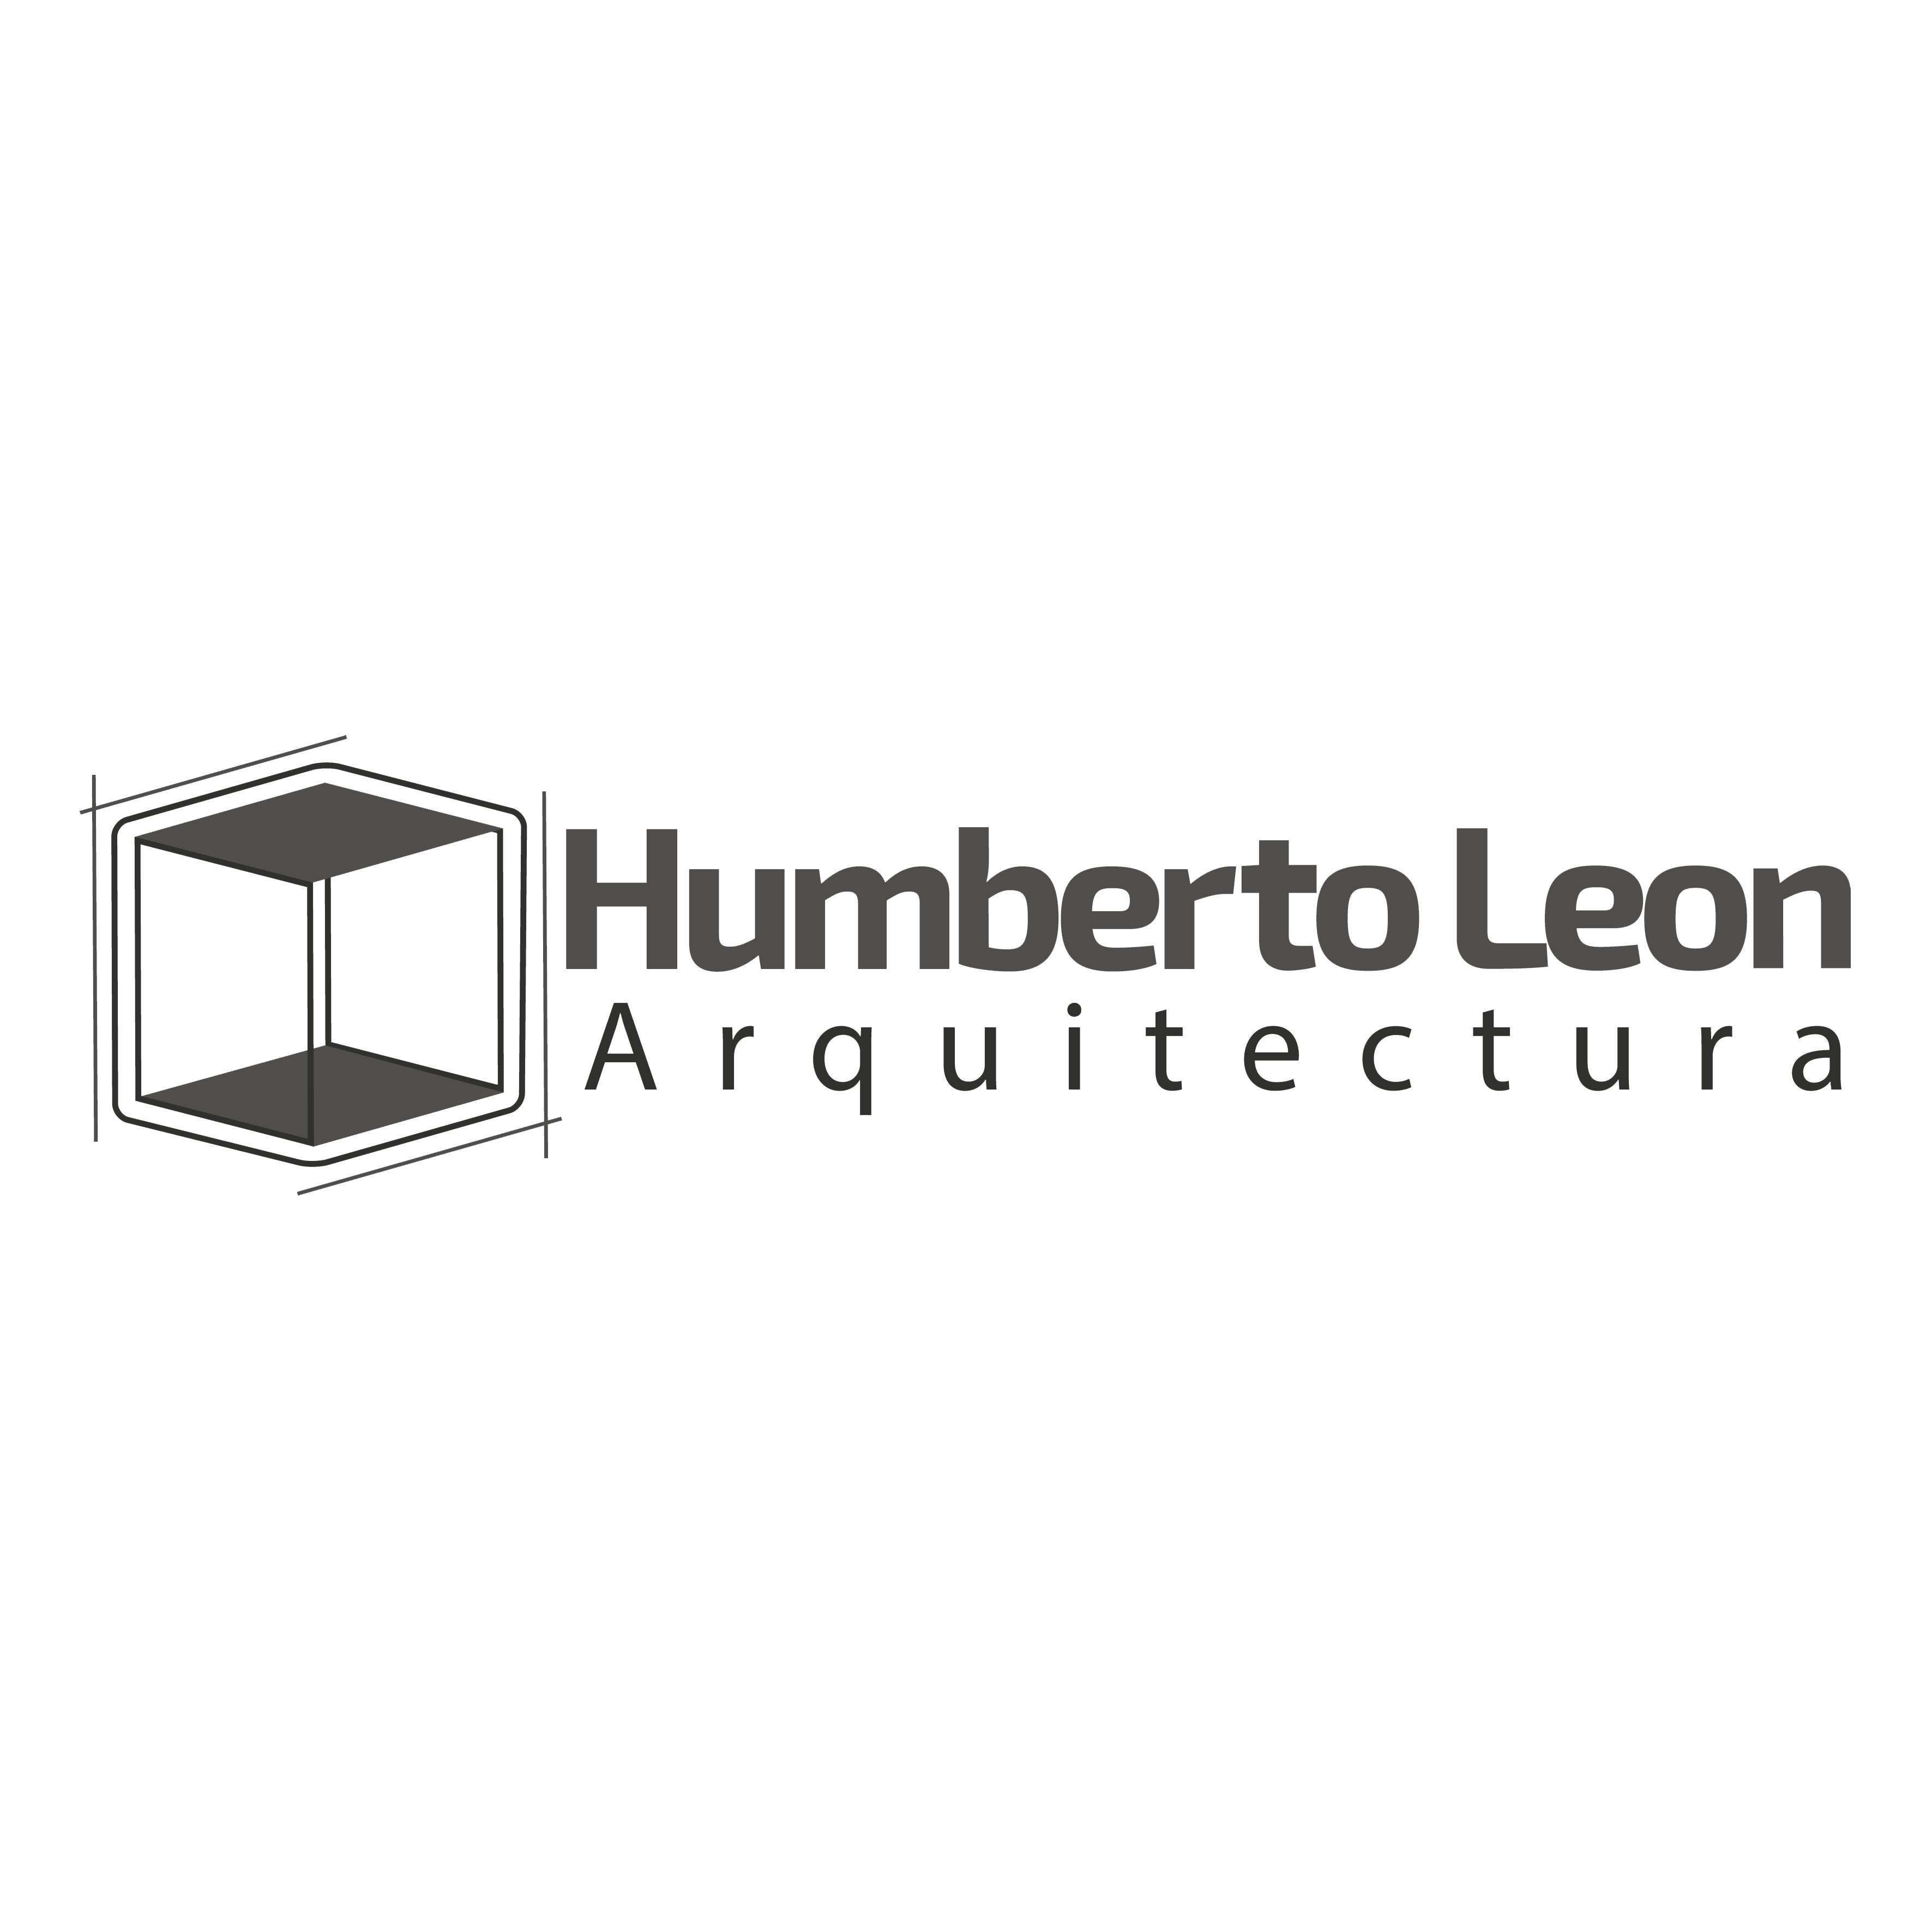 Arq. Humberto Leon